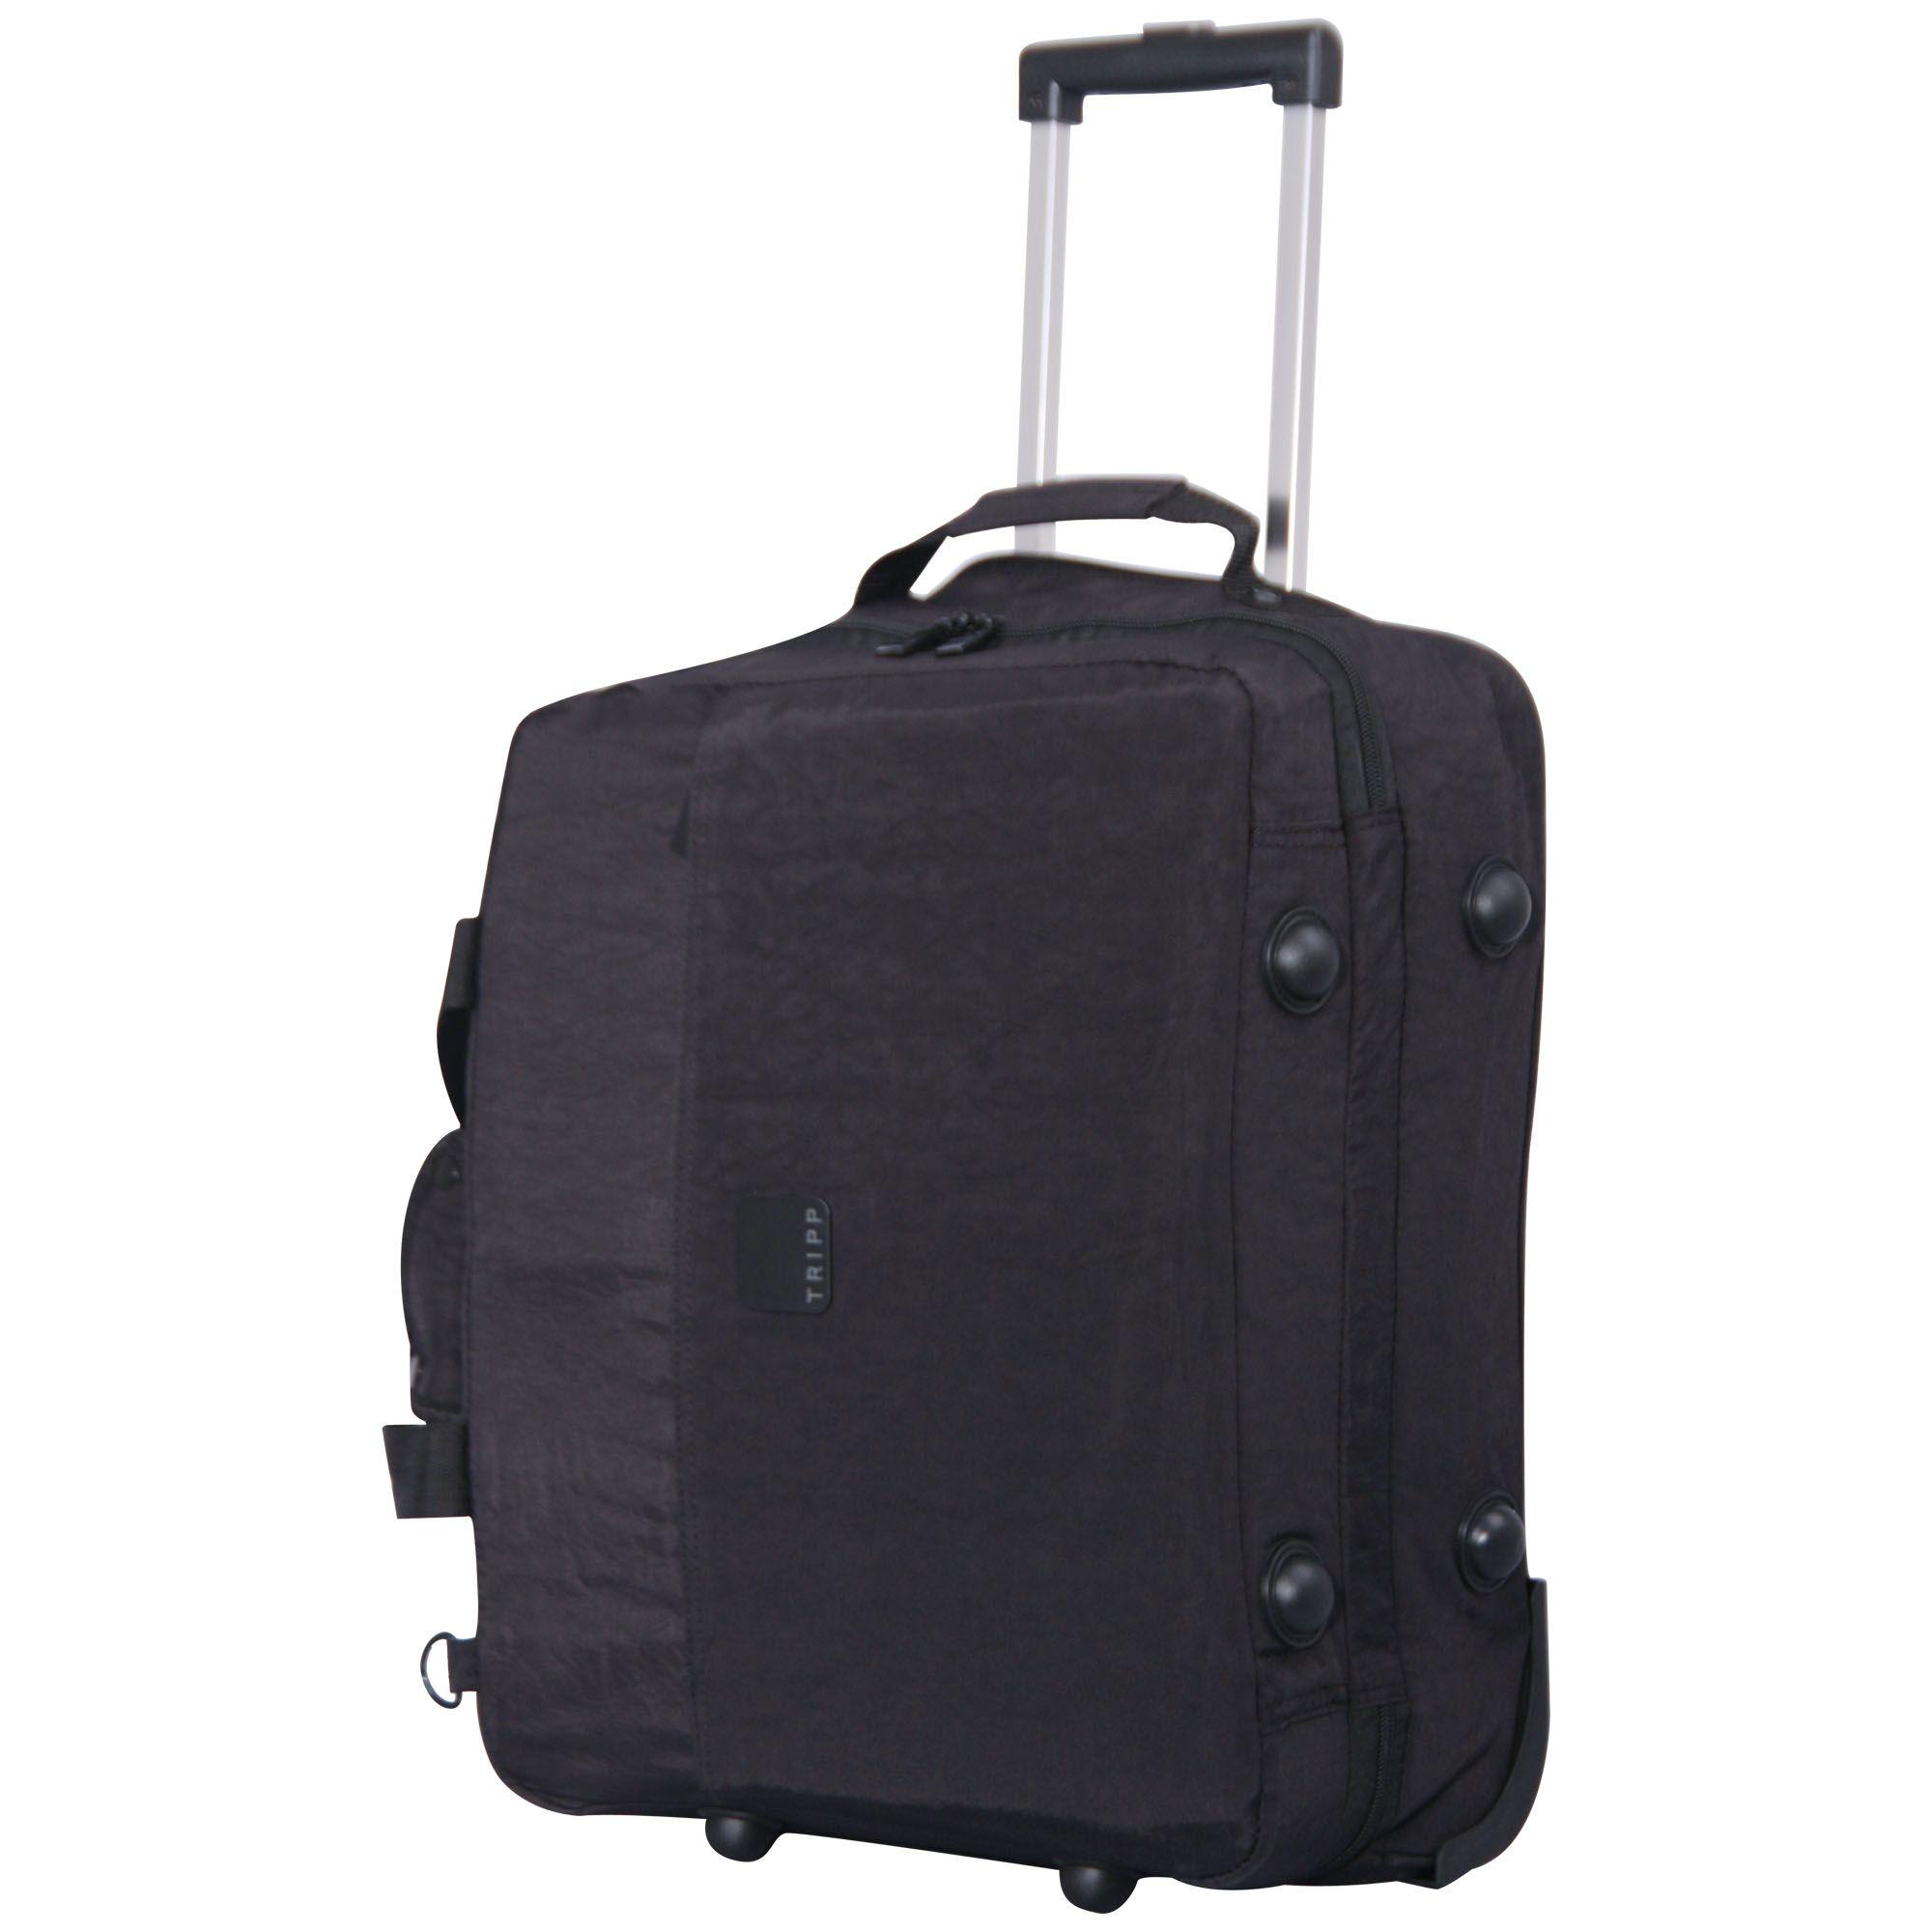 Tripp Black Holiday Bags 2 Wheel Cabin Duffle Soft